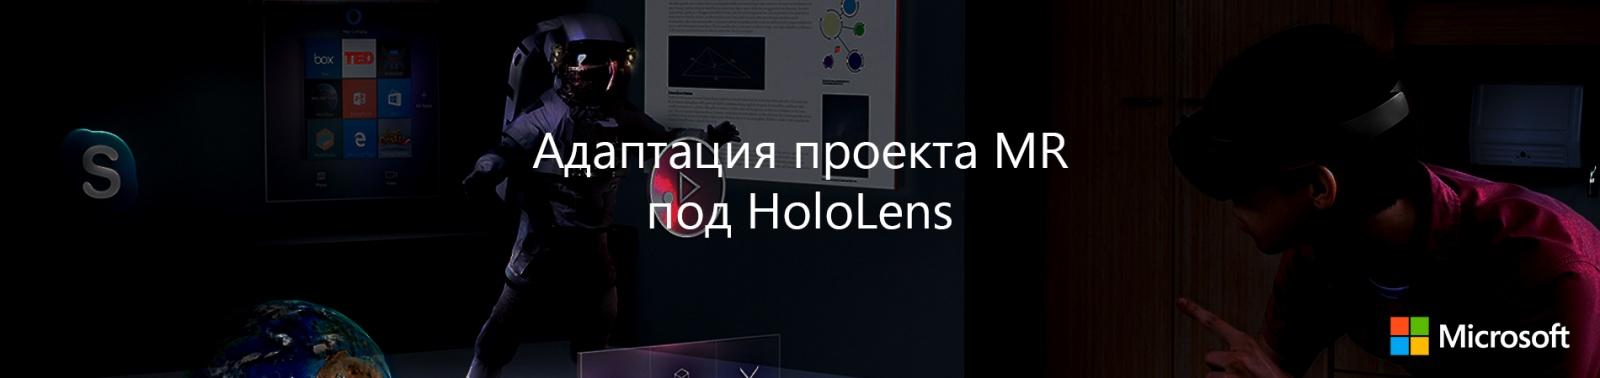 Адаптация проекта MR под HoloLens - 1